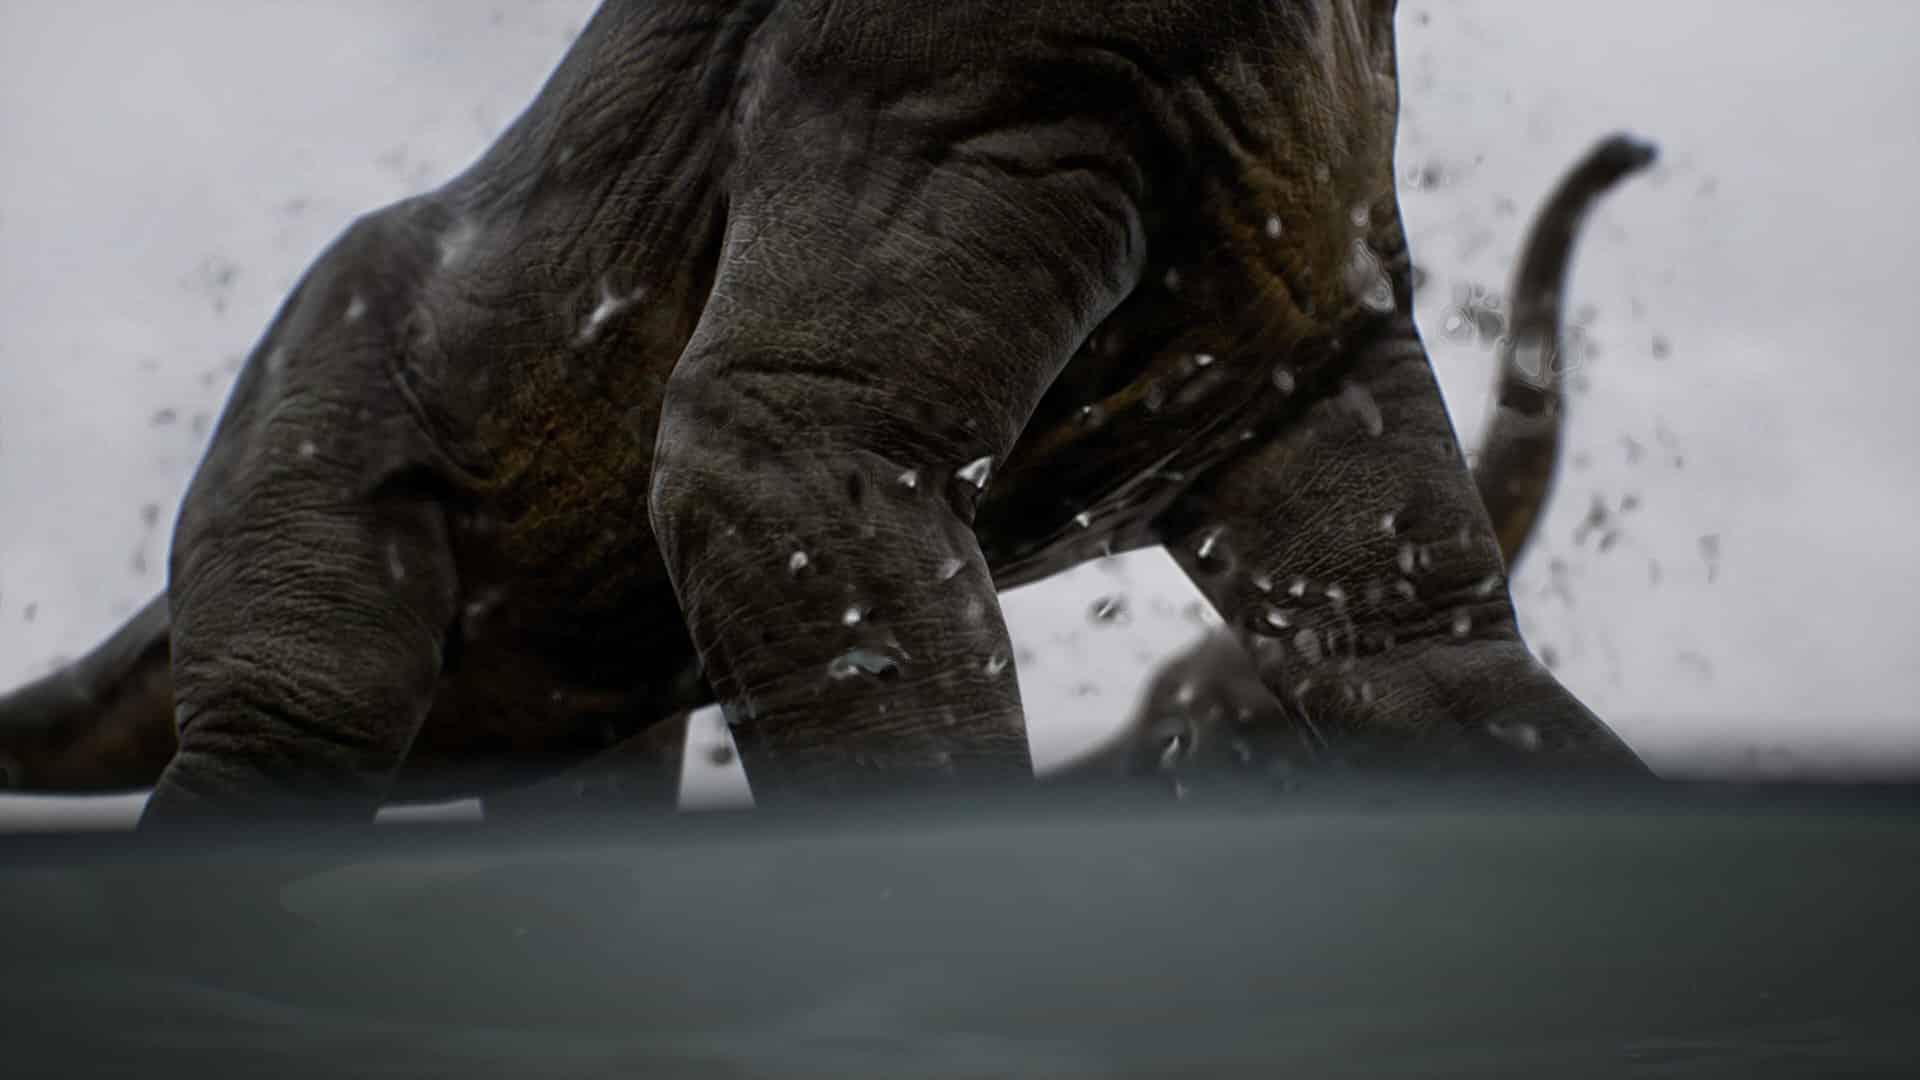 Instinction interview Hashbane Jade Saunders Richard Gold Dino Crisis dinosaur survival action